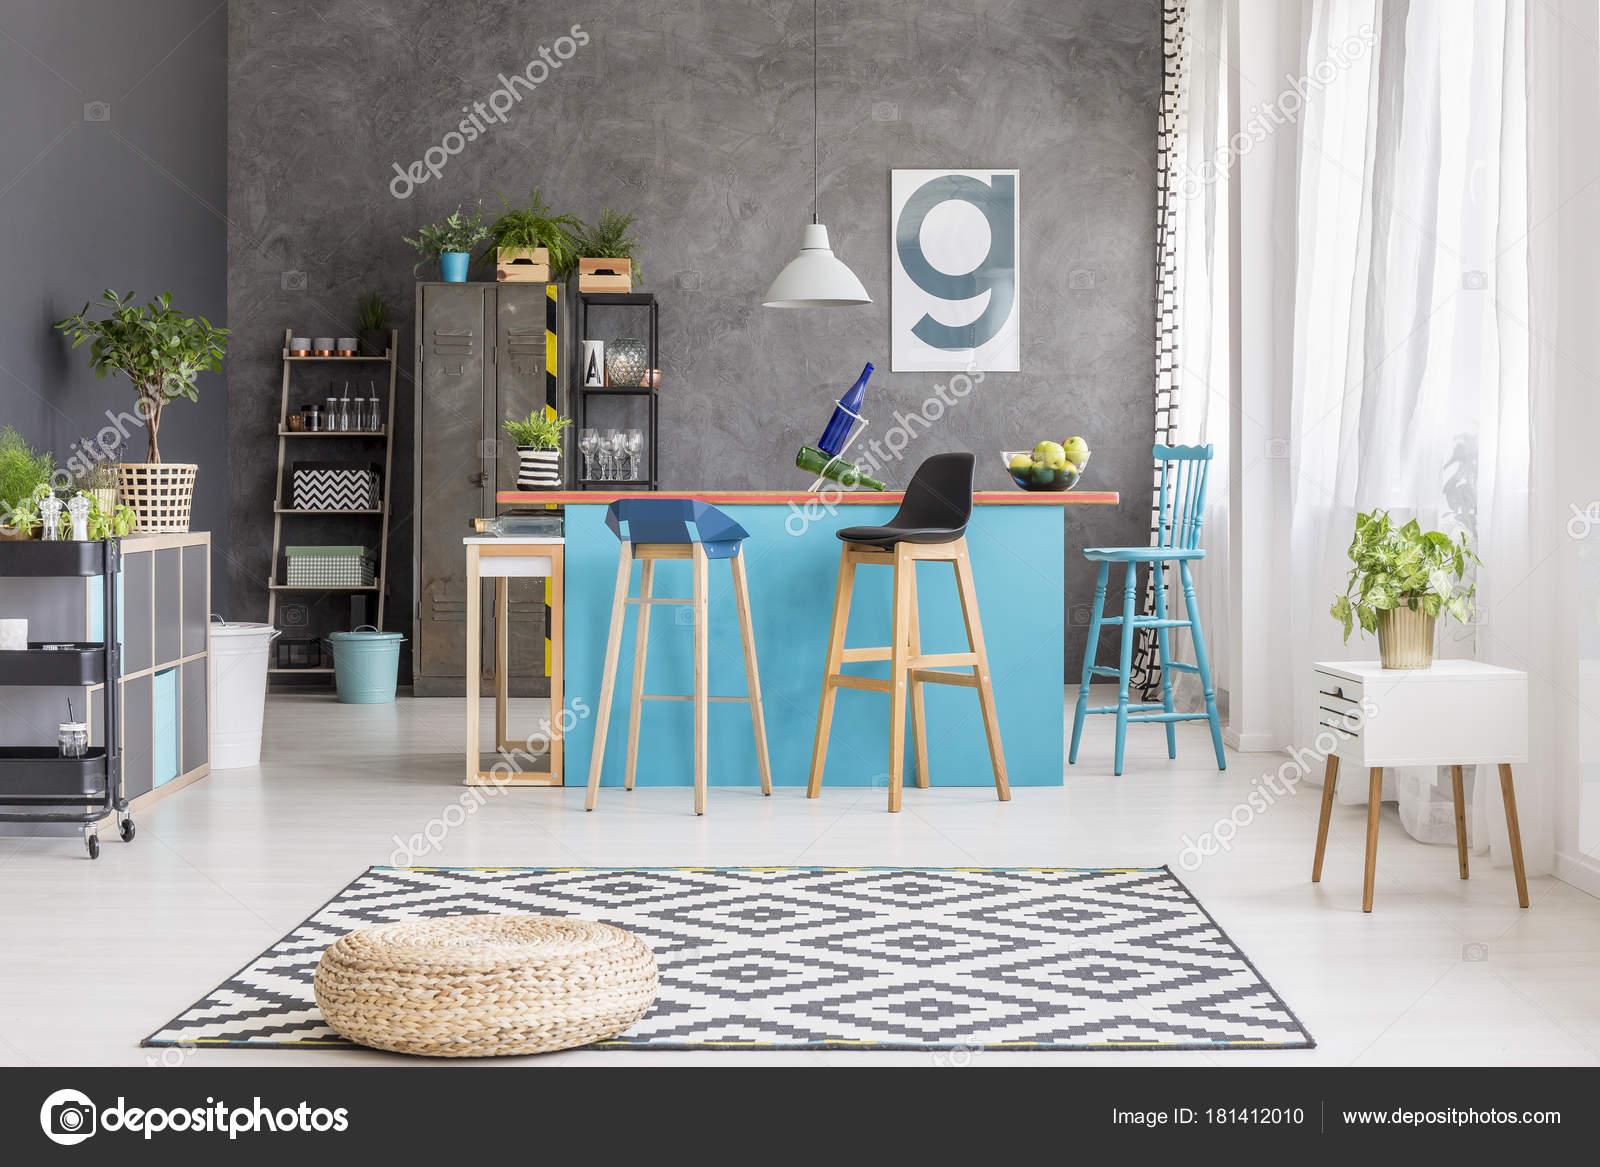 black kitchen rugs country decor 几何地毯上的凳 图库照片 c photographee eu 181412010 藤凳在黑色和白色地毯与几何样式说谎在一个蓝色厨房海岛前面在饭厅内部 照片作者photographee